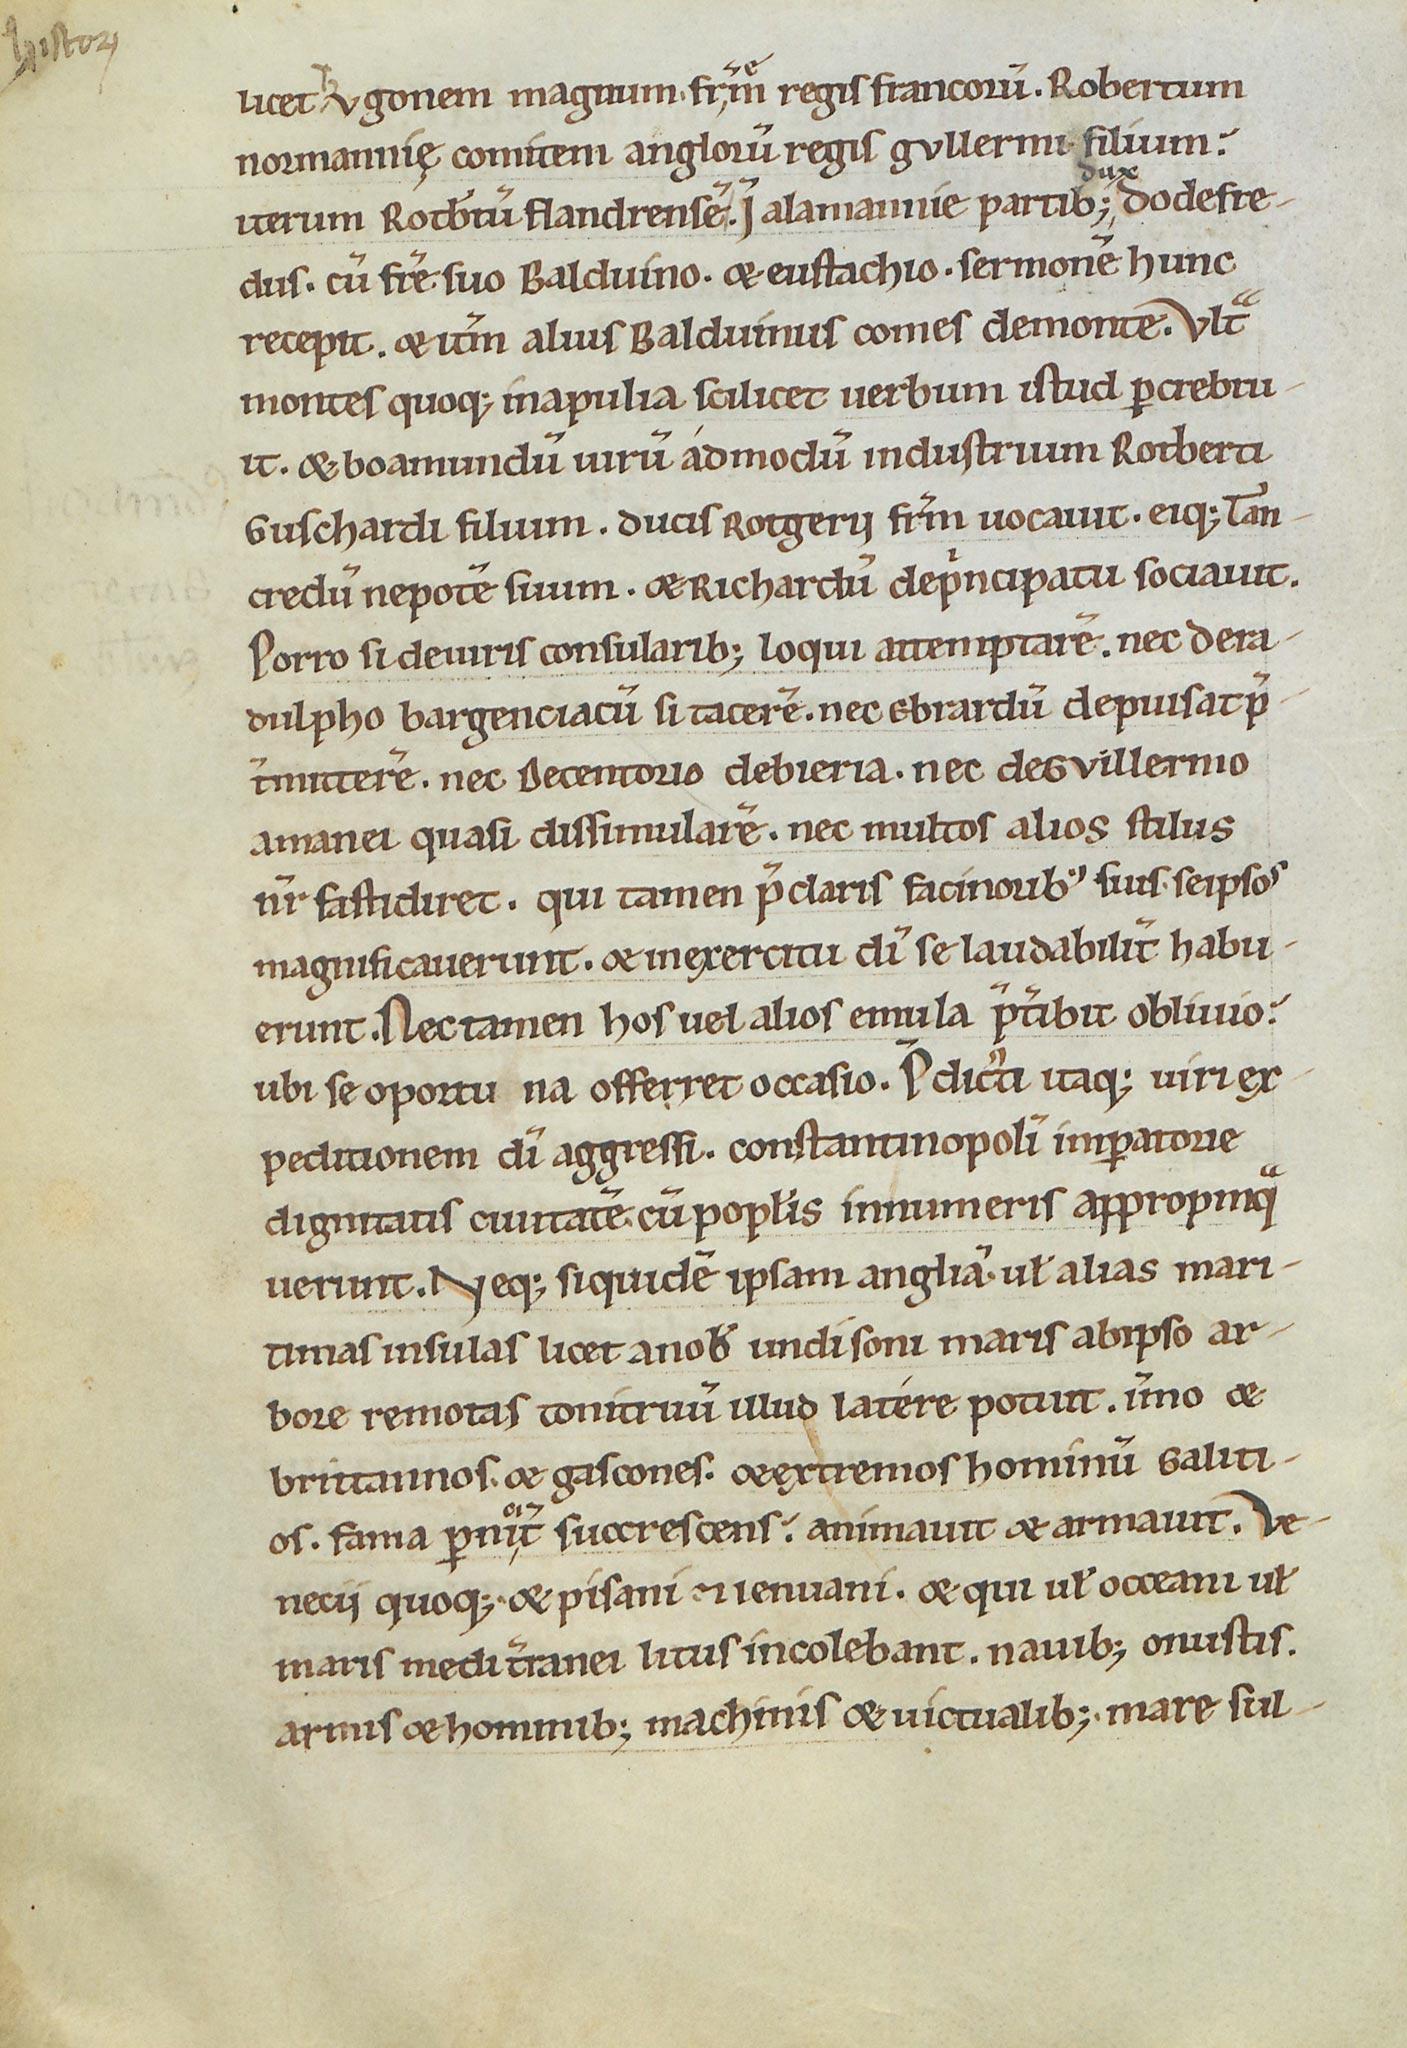 Manuscrit-Historia-Hierosolimitana-26v°